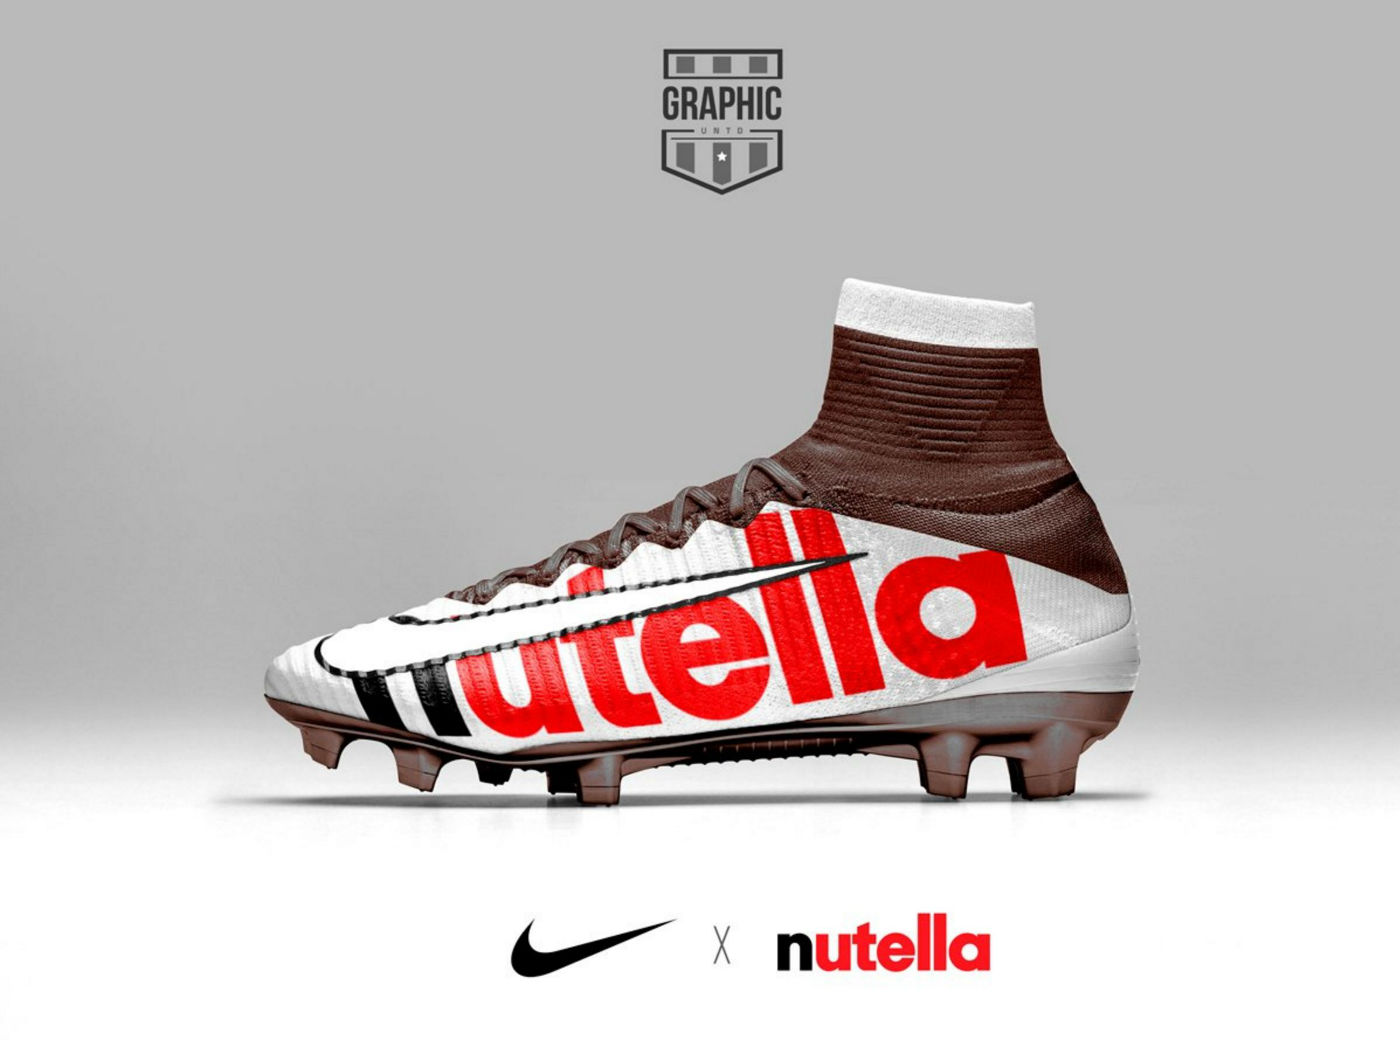 bedcc963f4b1 Nike Mercurial Nutella | Soccer Cleats 101